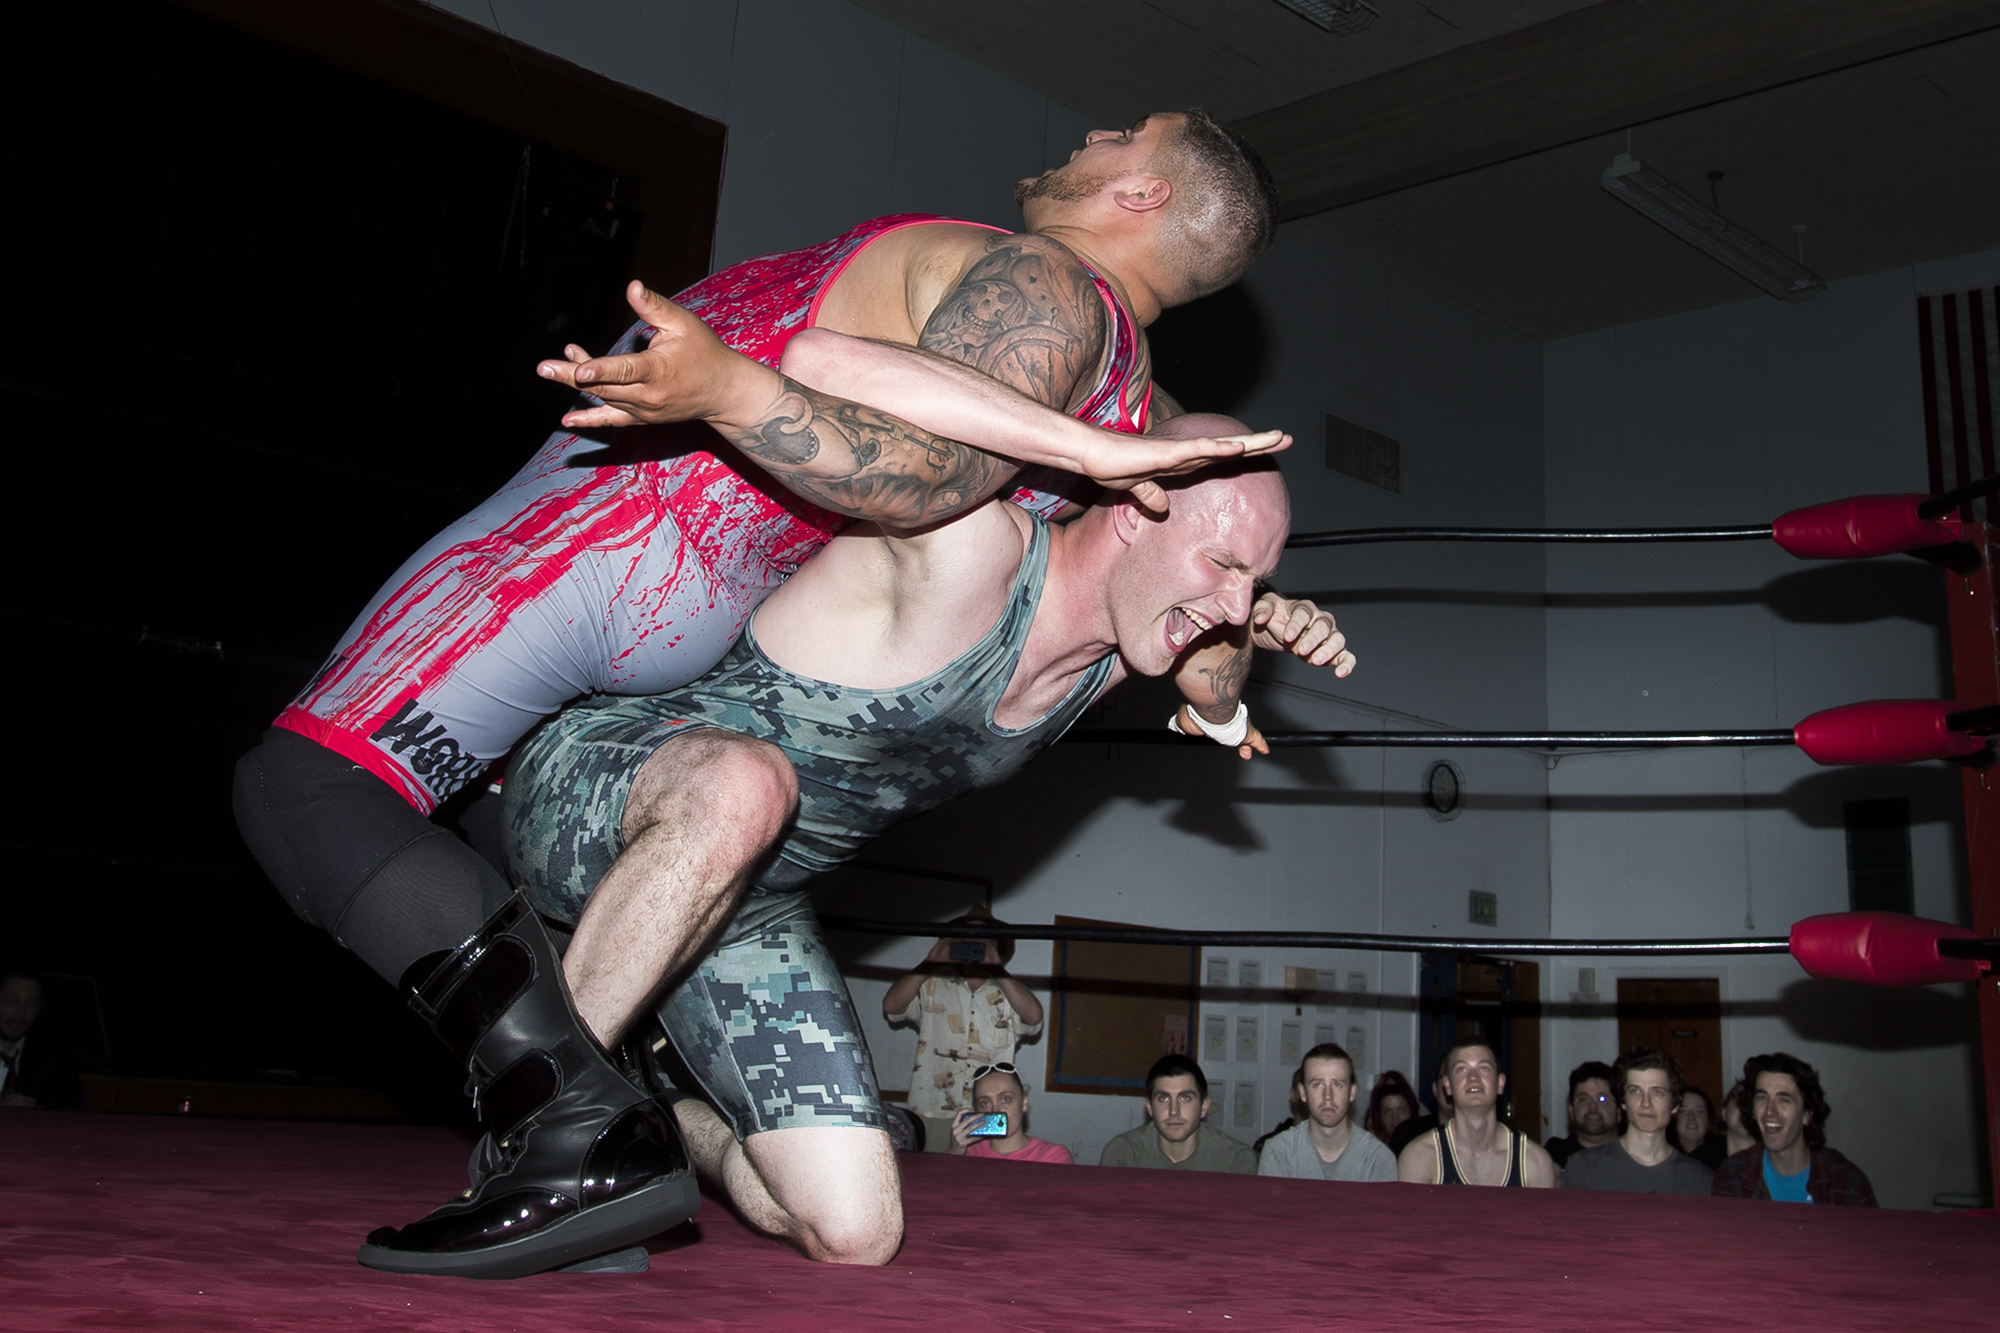 004399828-Professional-wrestler_13